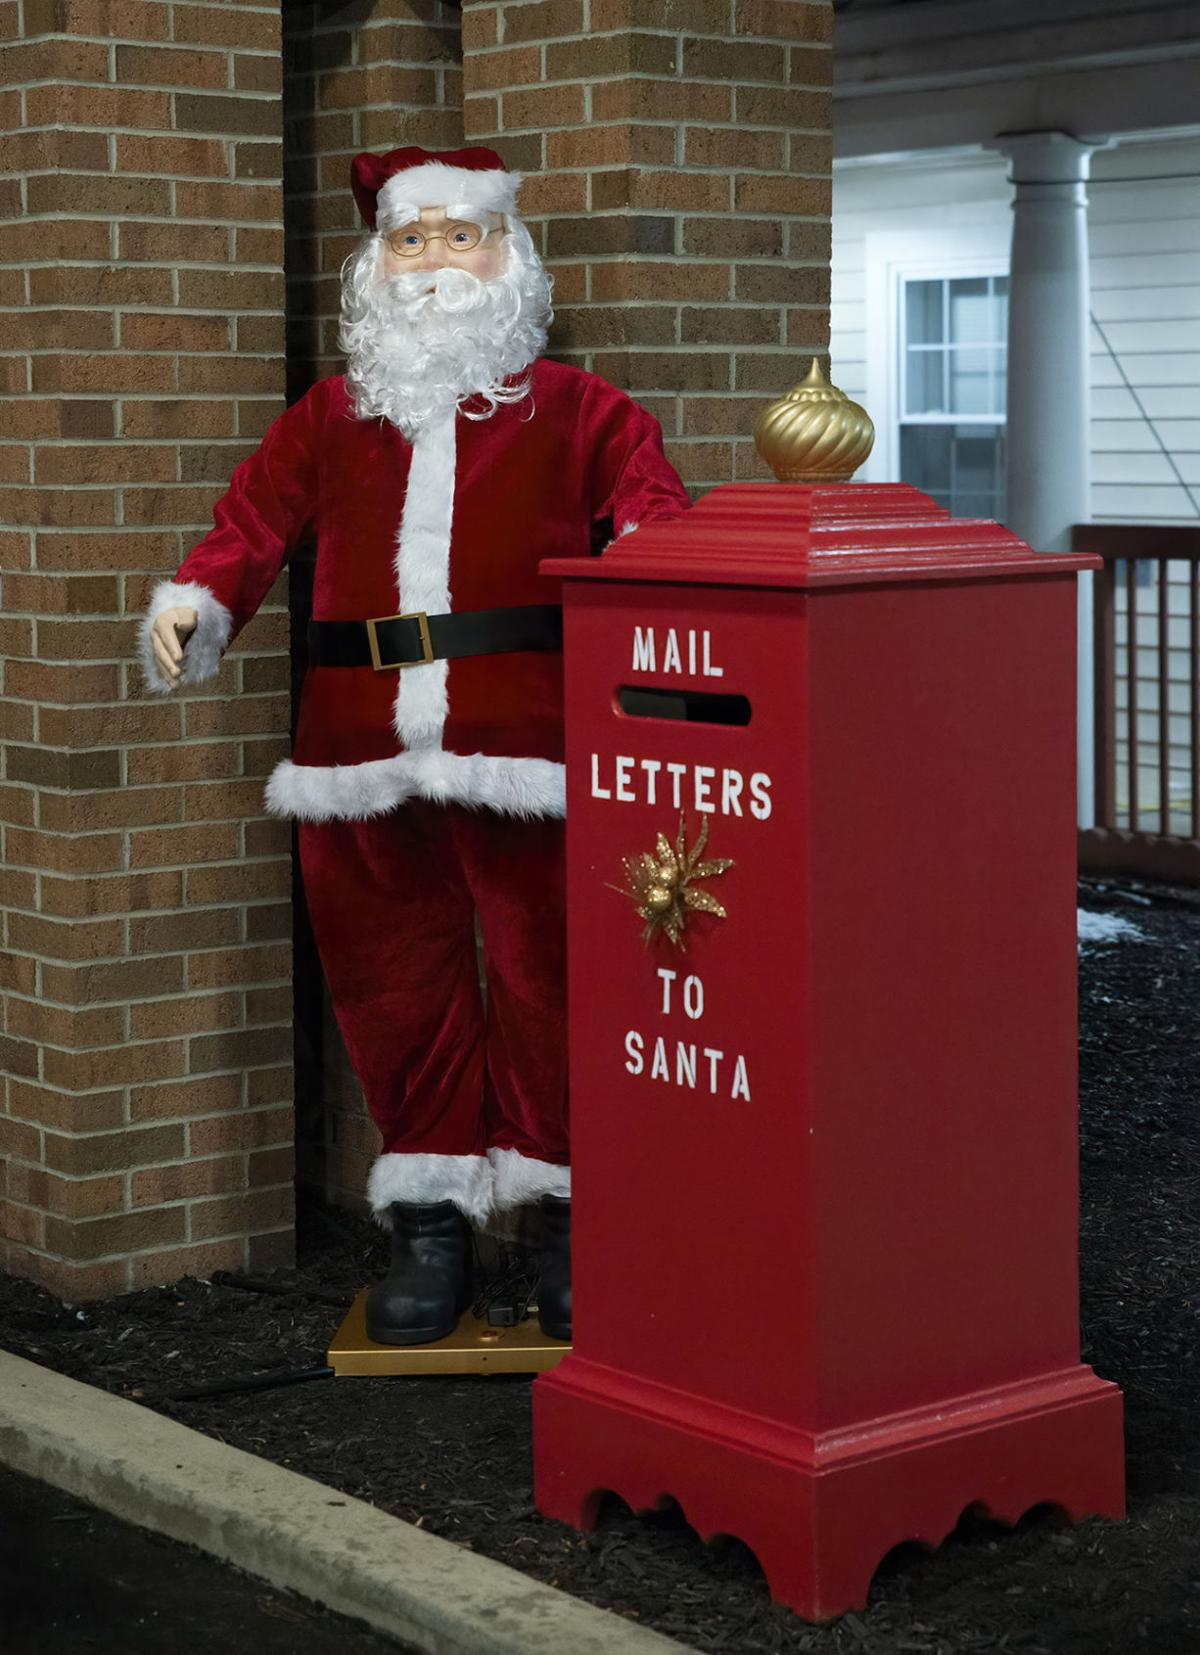 Ecumenical Home enjoys Christmas display, holiday activities